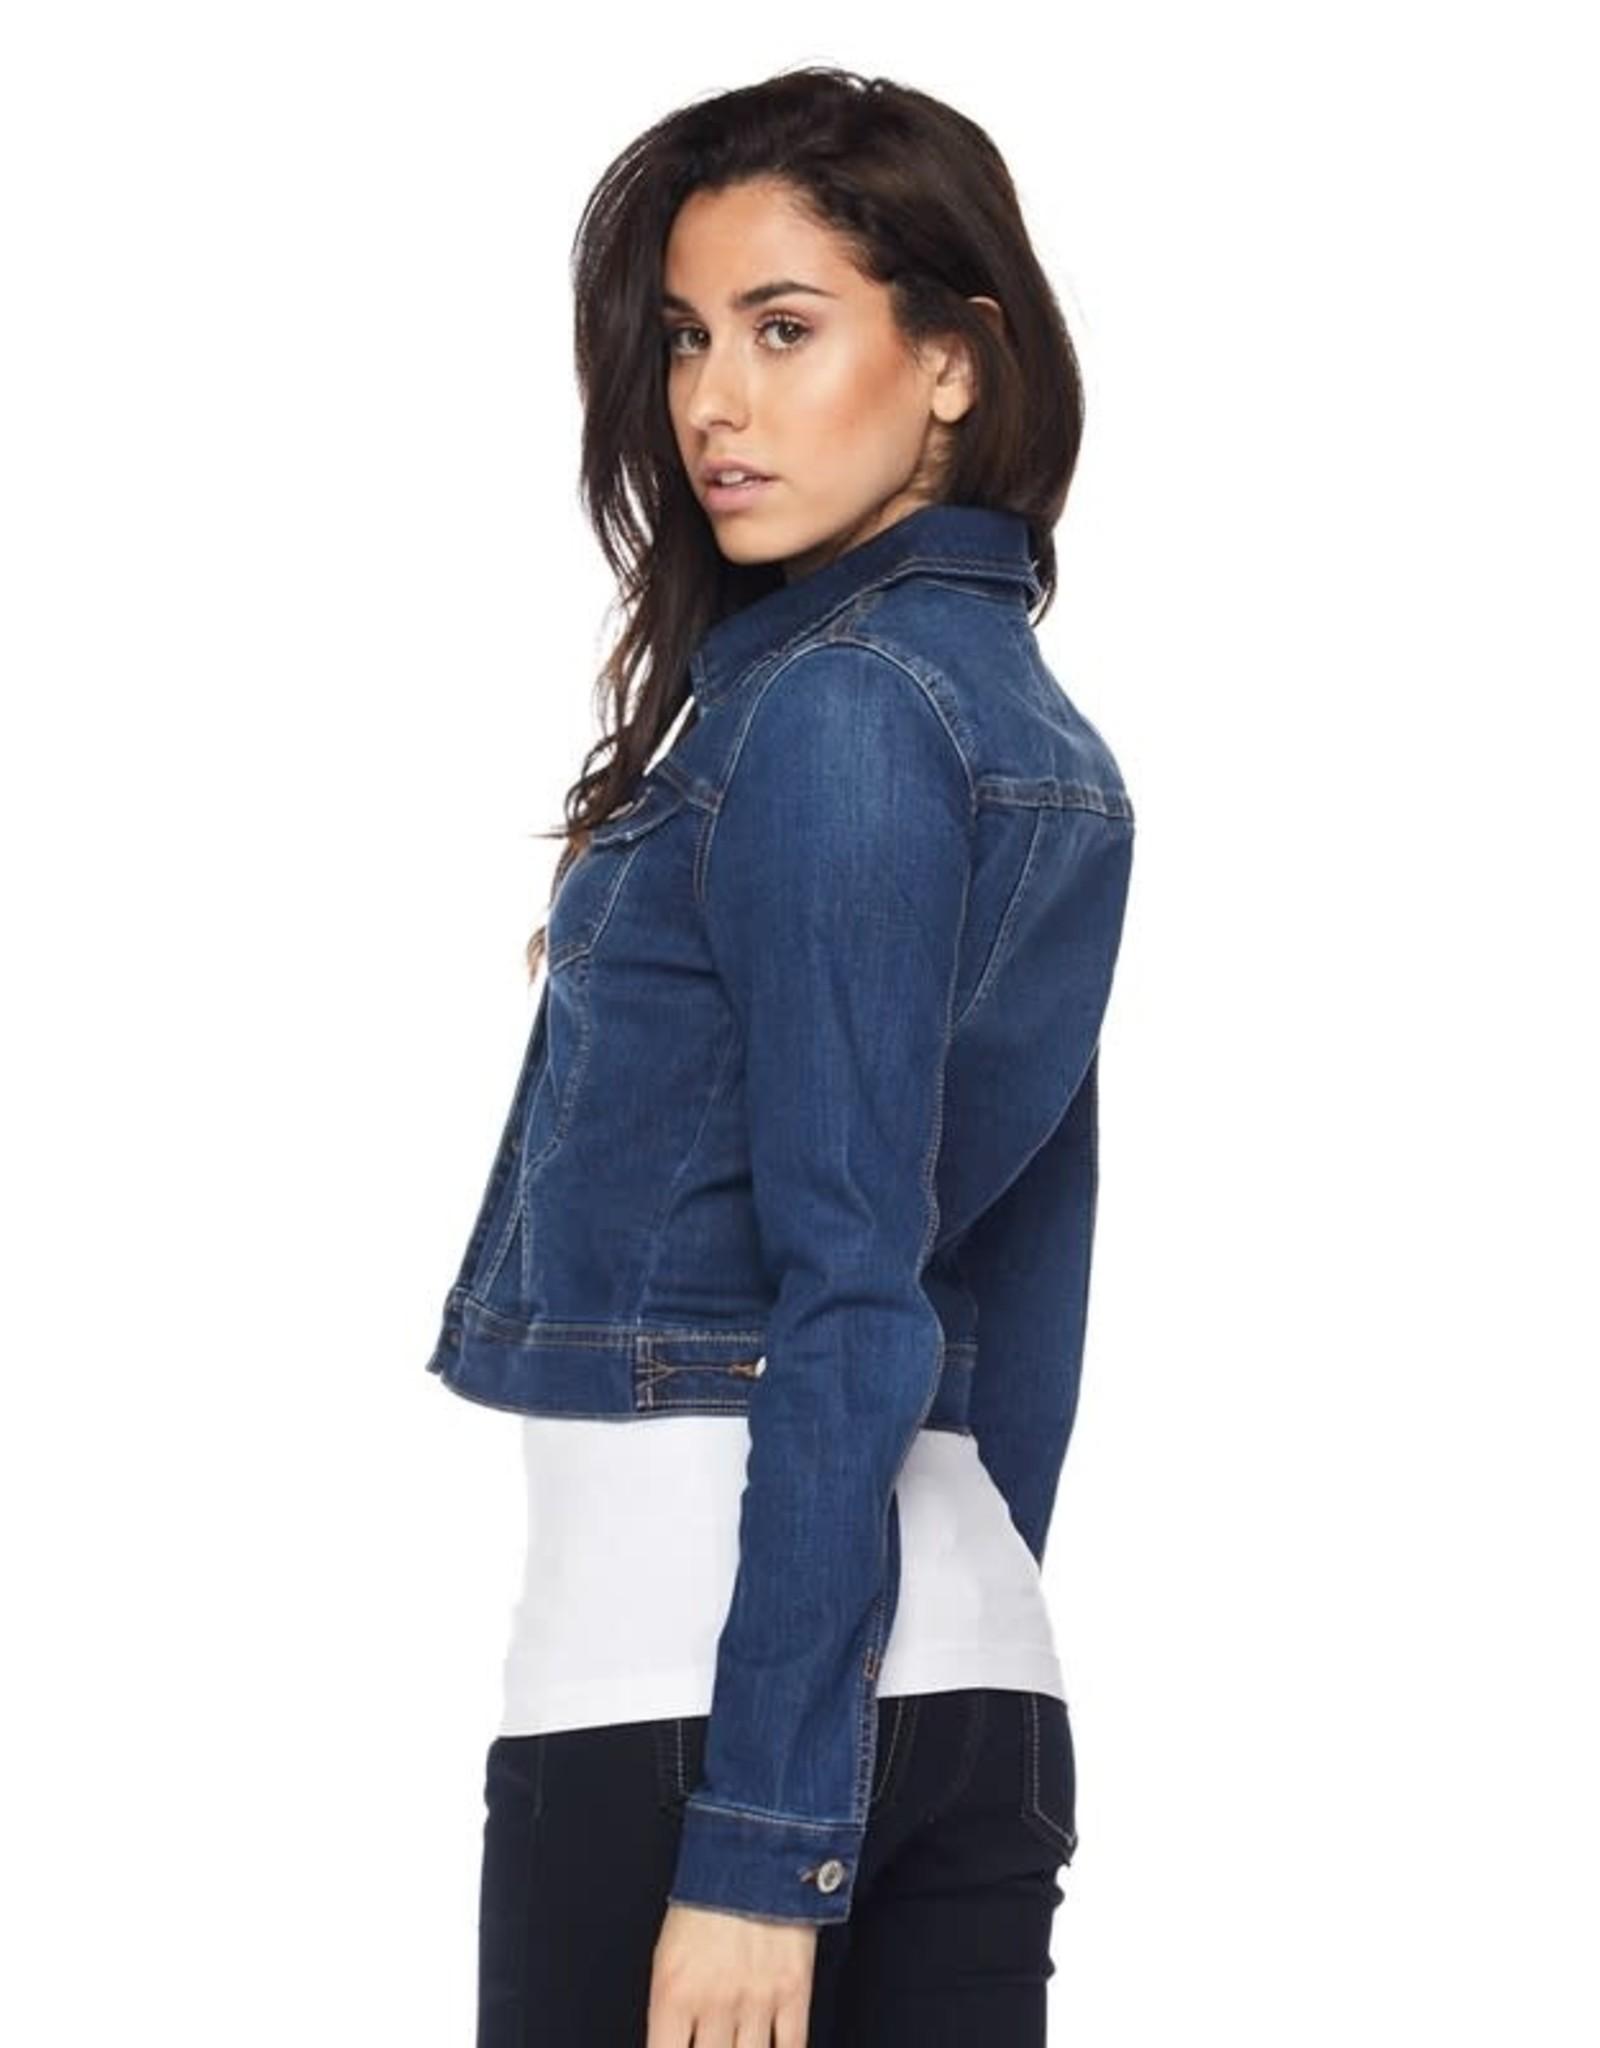 fashiongo QUEEN JEAN jacket